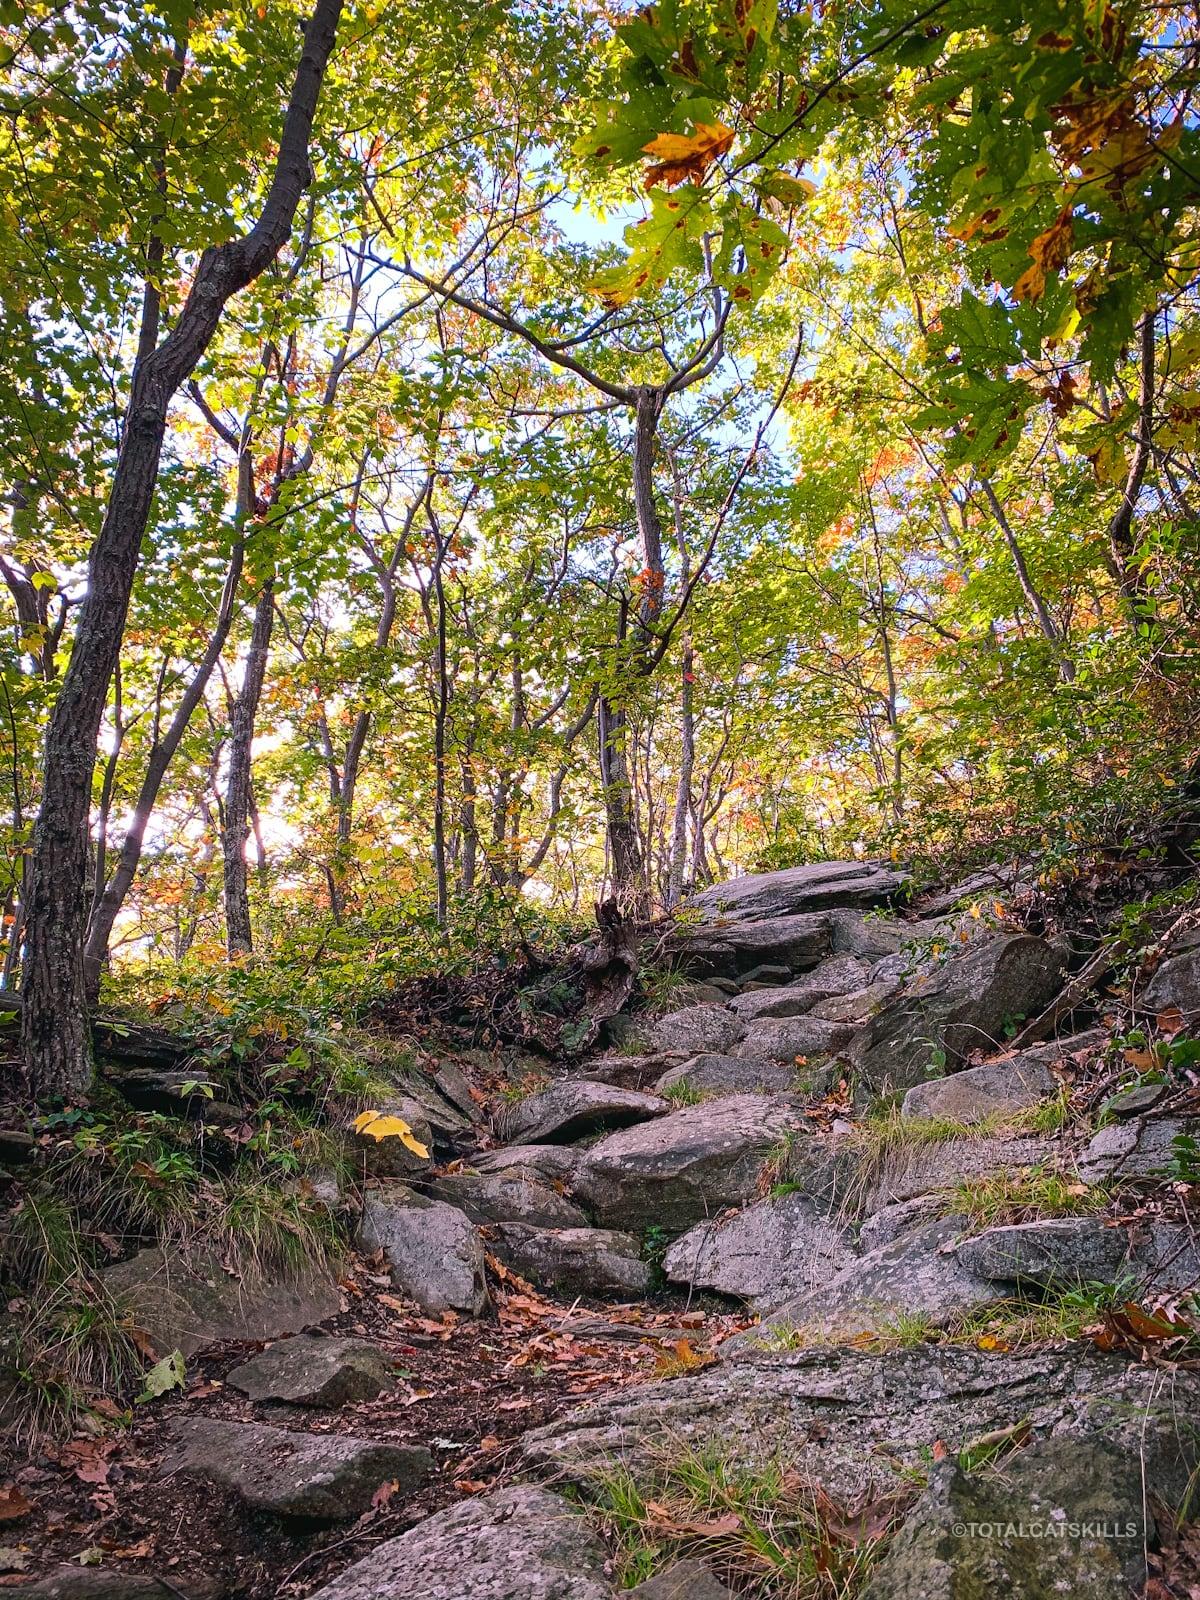 rocky trail in woods